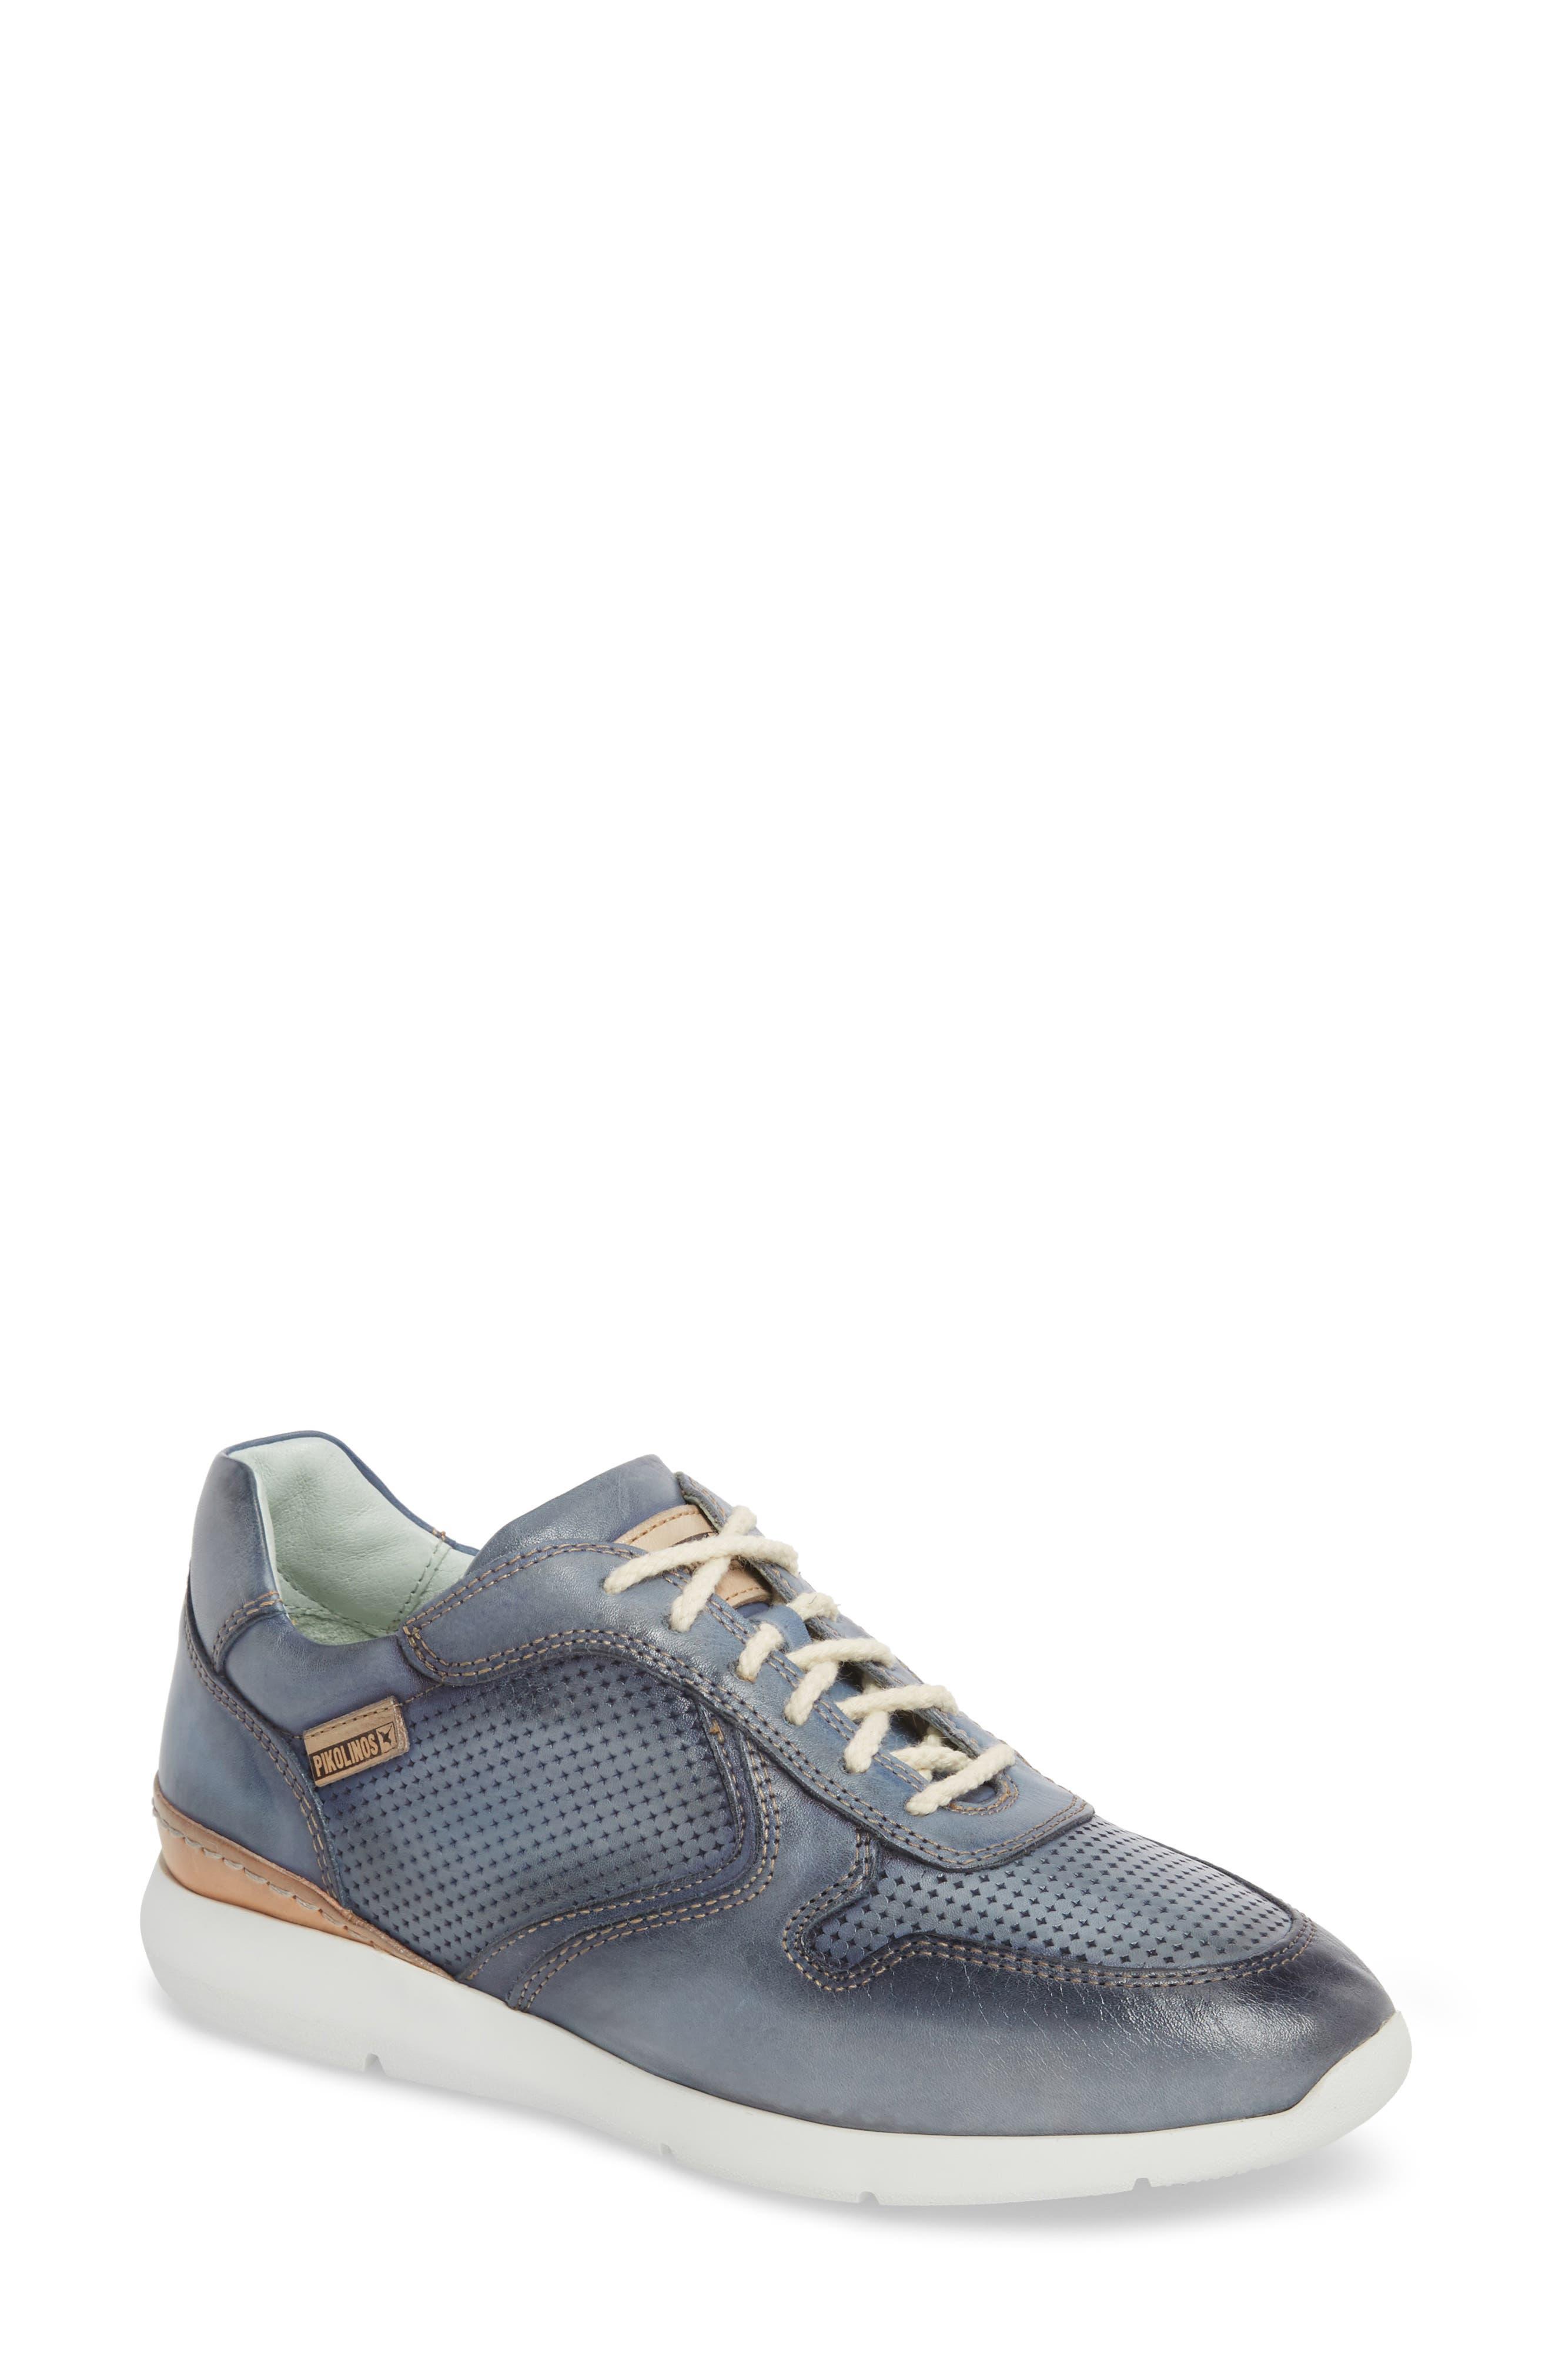 Modena Sneaker,                         Main,                         color, 400